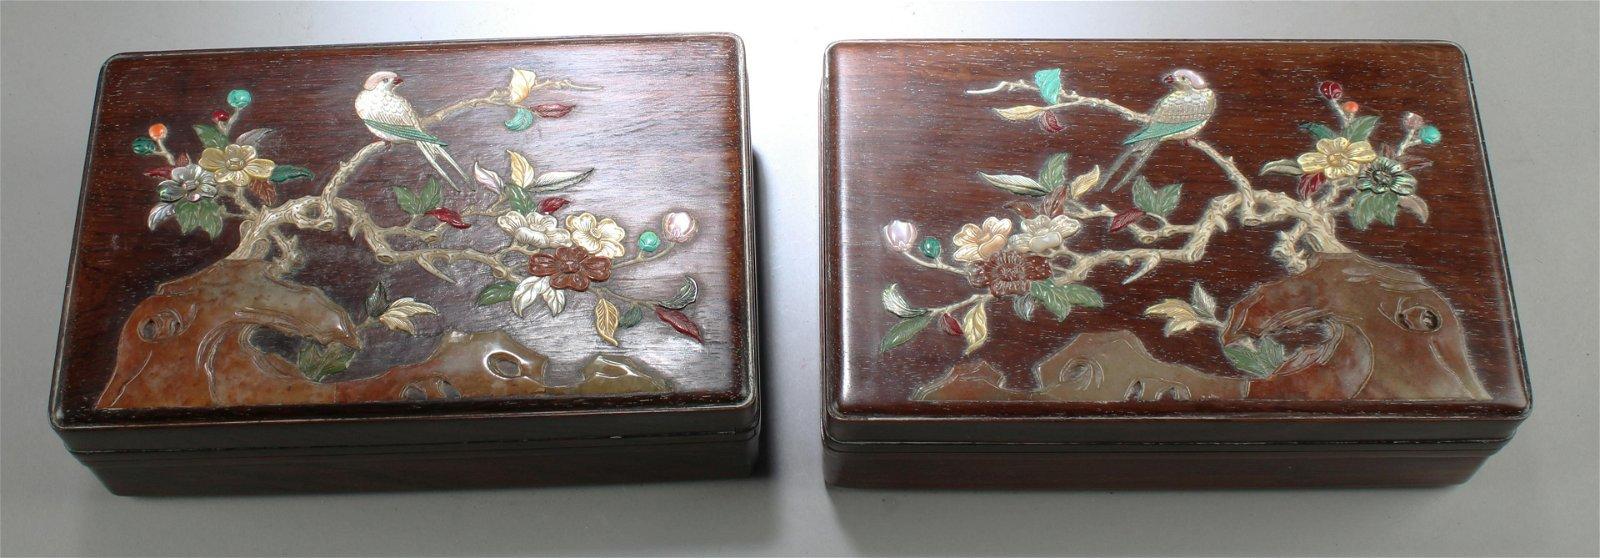 Two Chinese Hardwood Rectangular Box